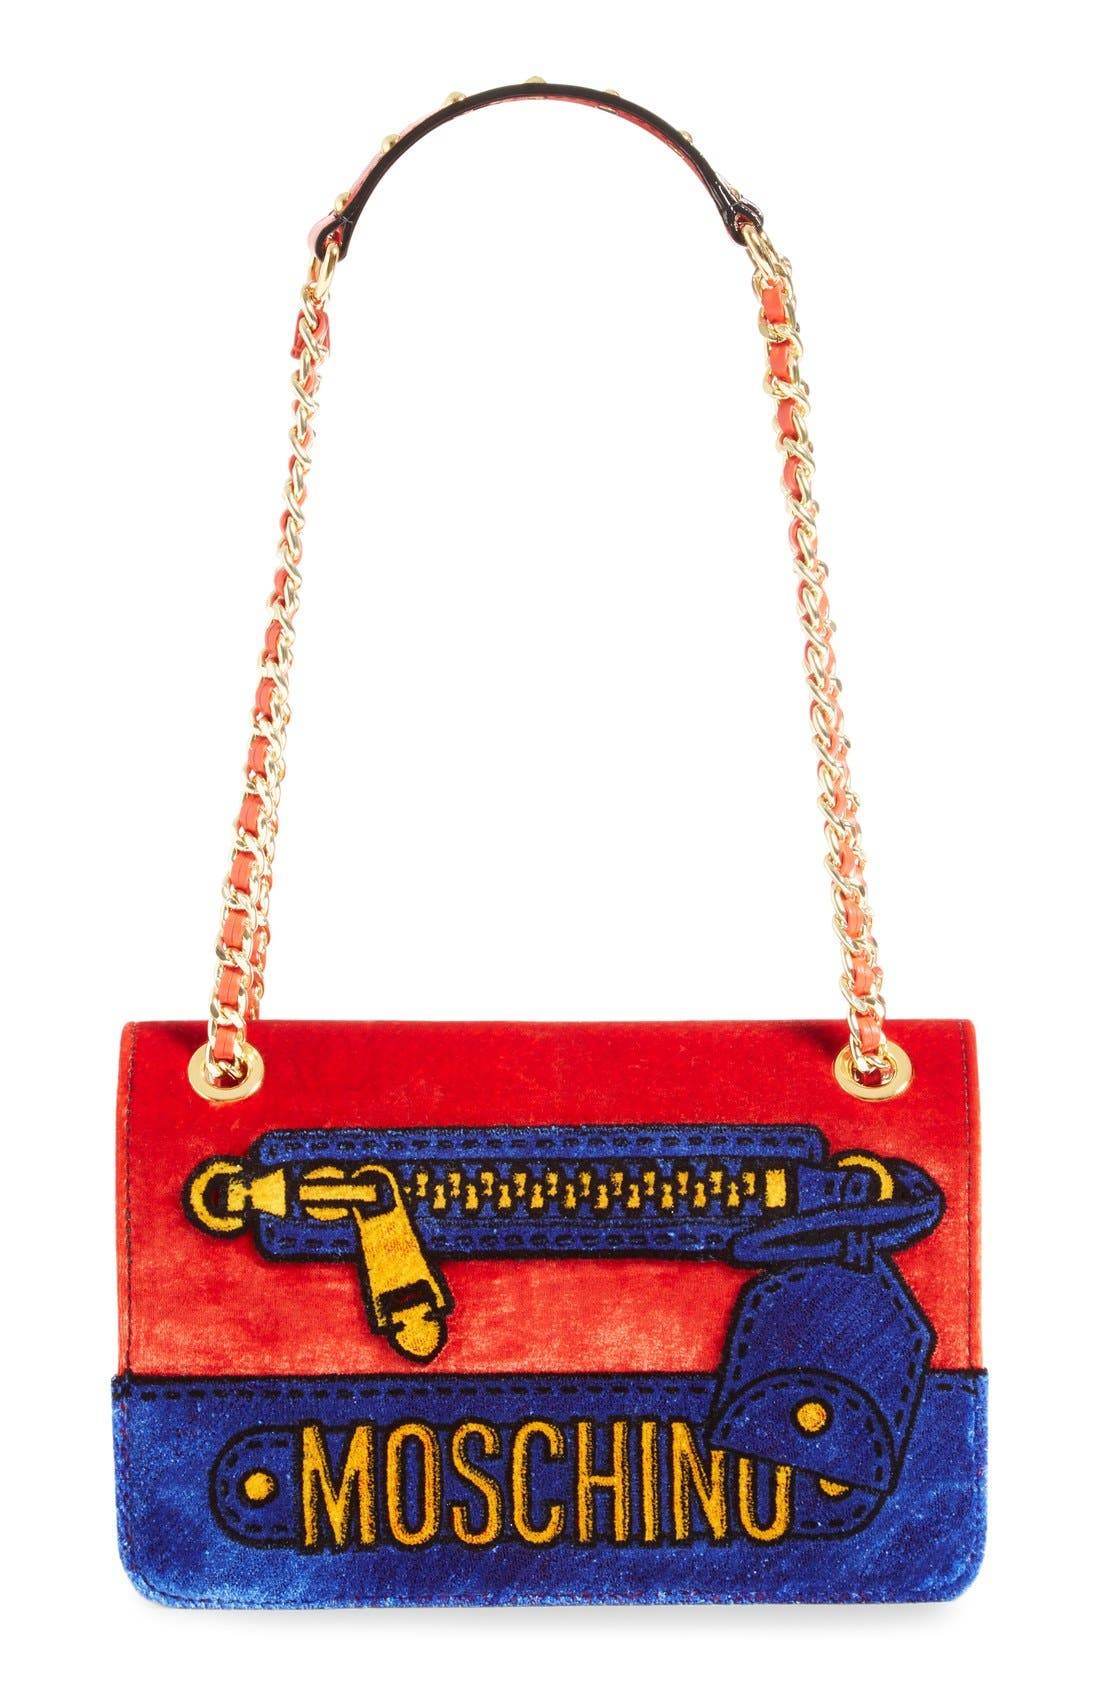 Alternate Image 1 Selected - Moschino Velvet Convertible Shoulder Bag